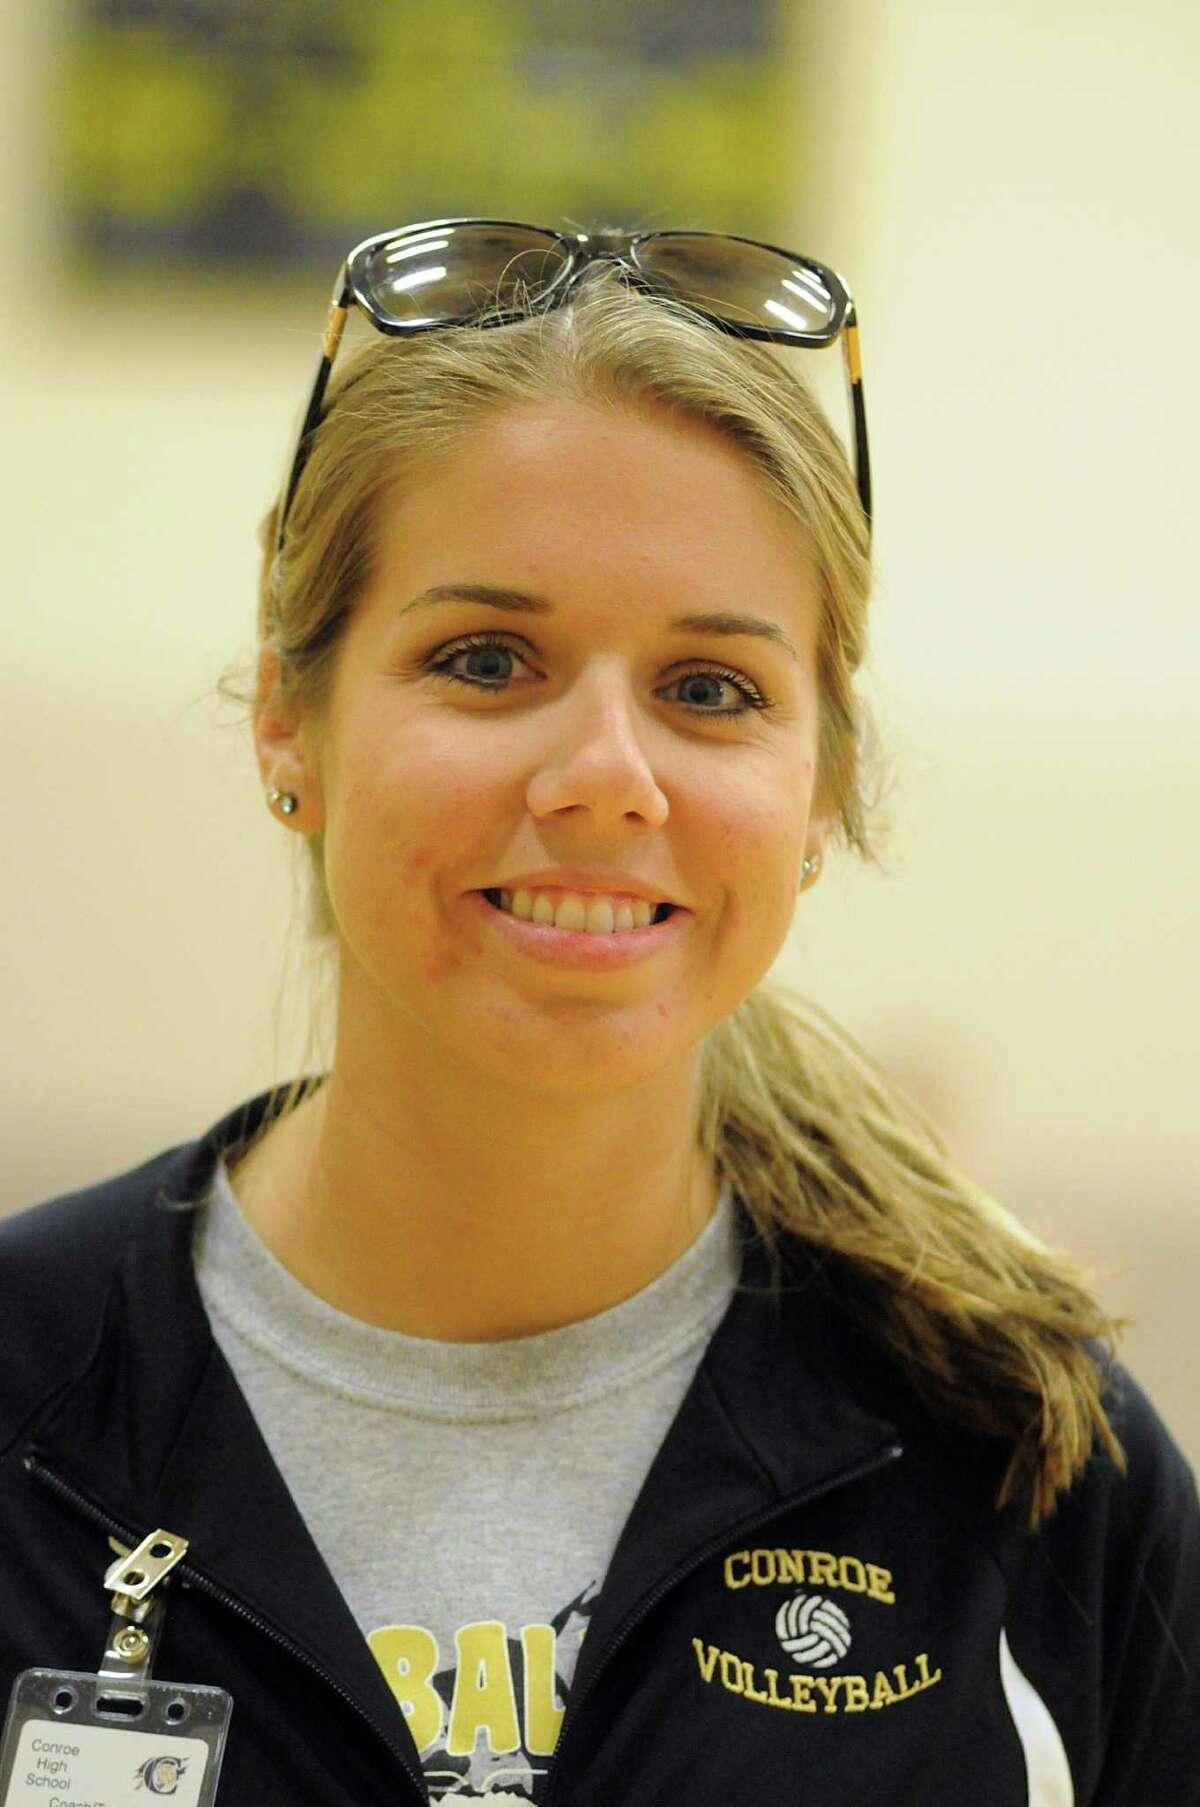 Conroe volleyball coach Lauren Leth